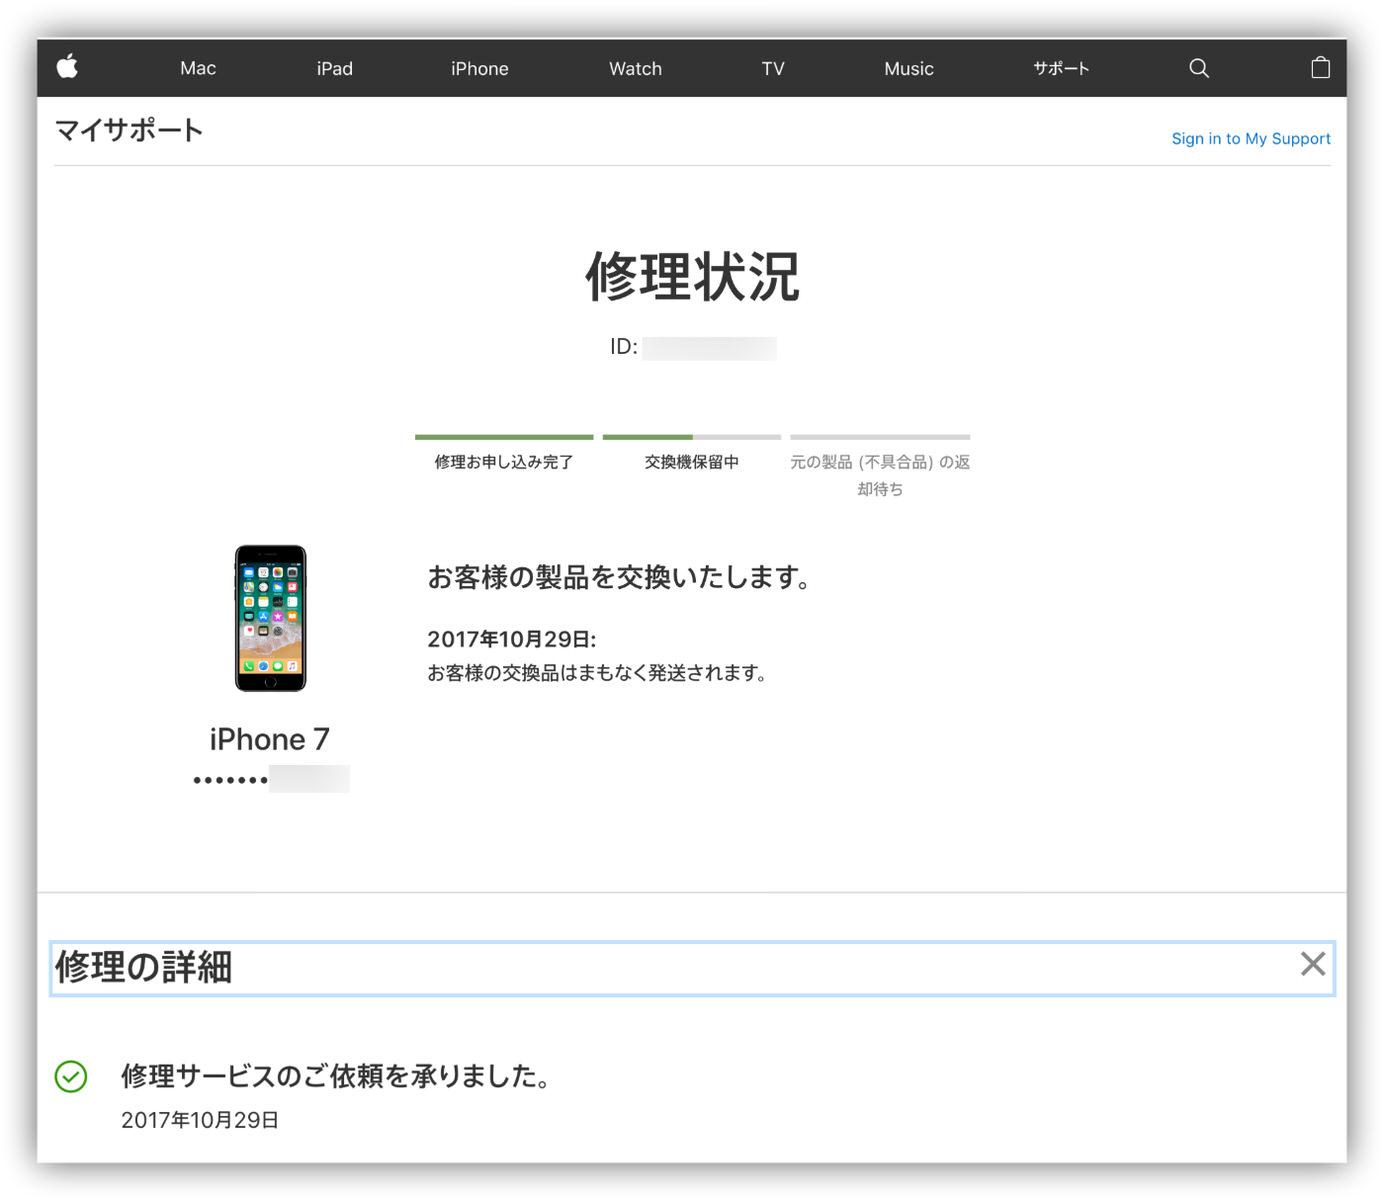 iPhoneエクスプレス交換サービス-6